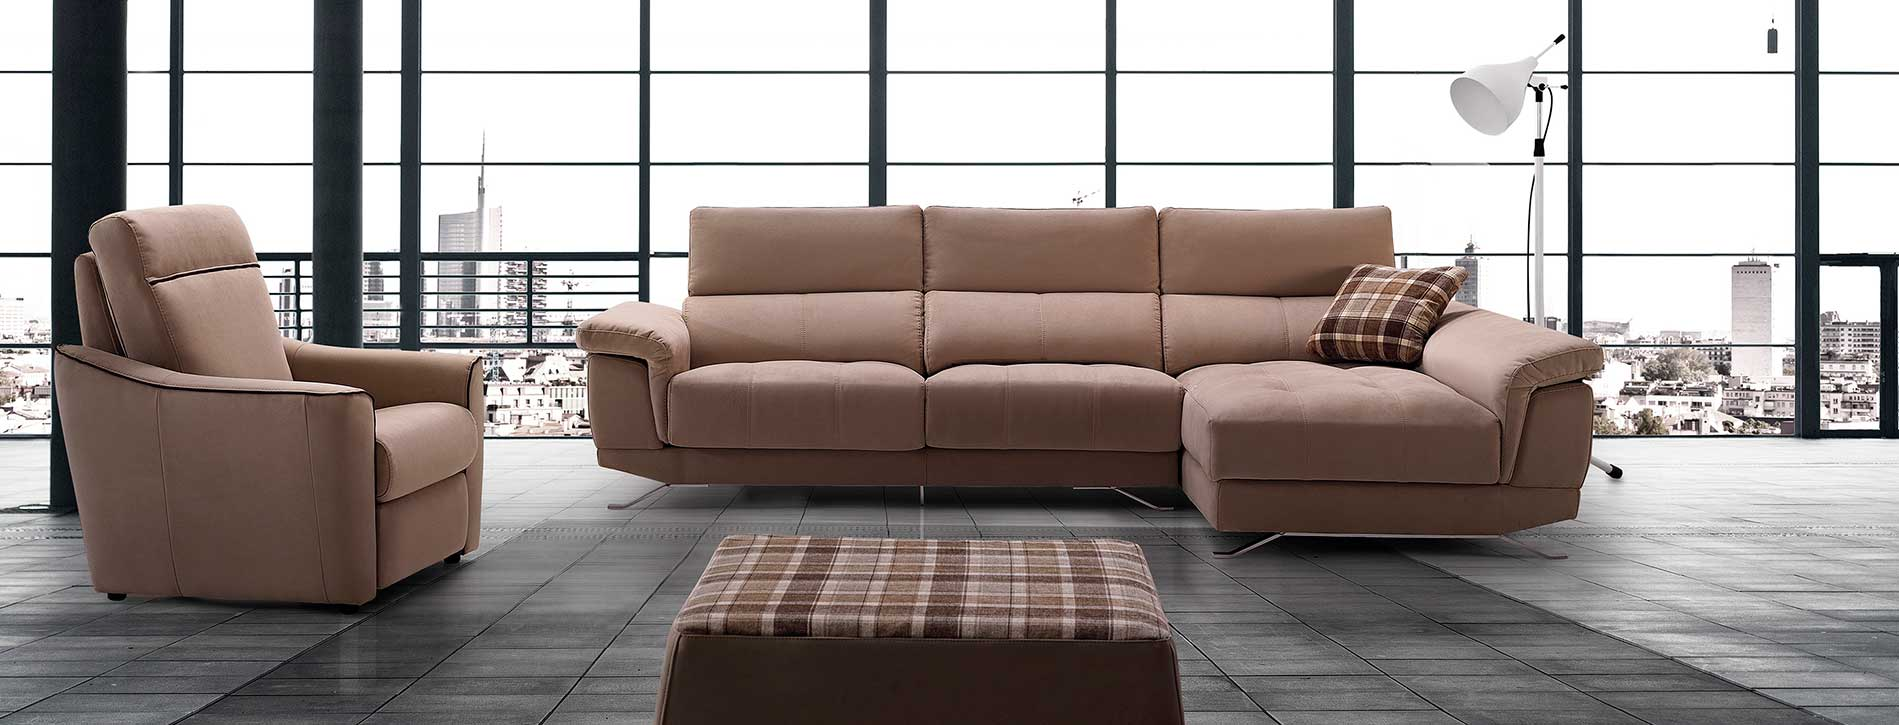 sofas-modernos-General-Divani-muebles-paco-caballero-1824-5cb617a4480d0